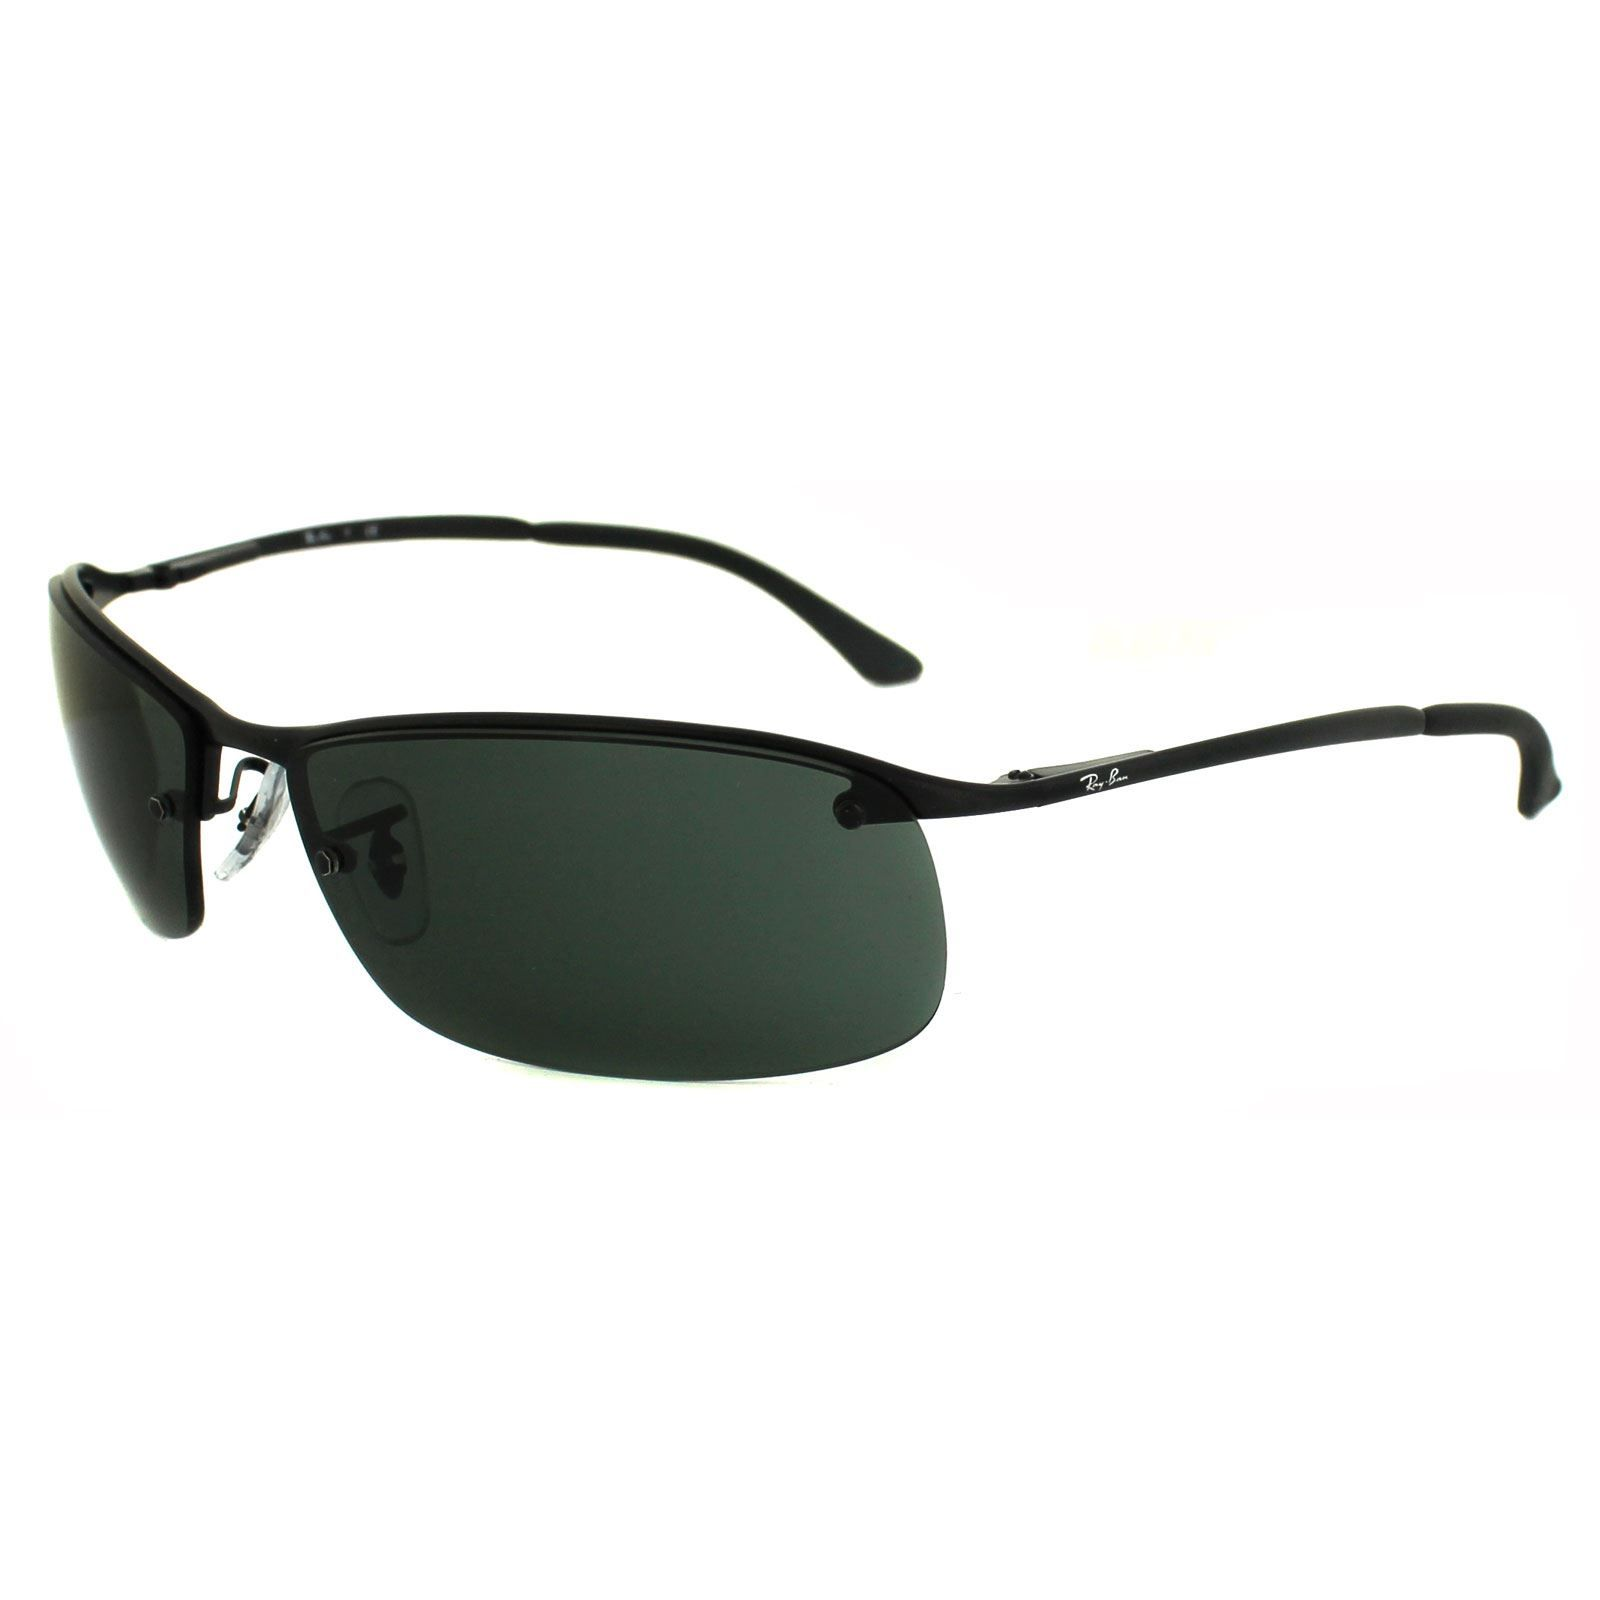 Ray-Ban Sunglasses 3183 006 71 Matt Black Green